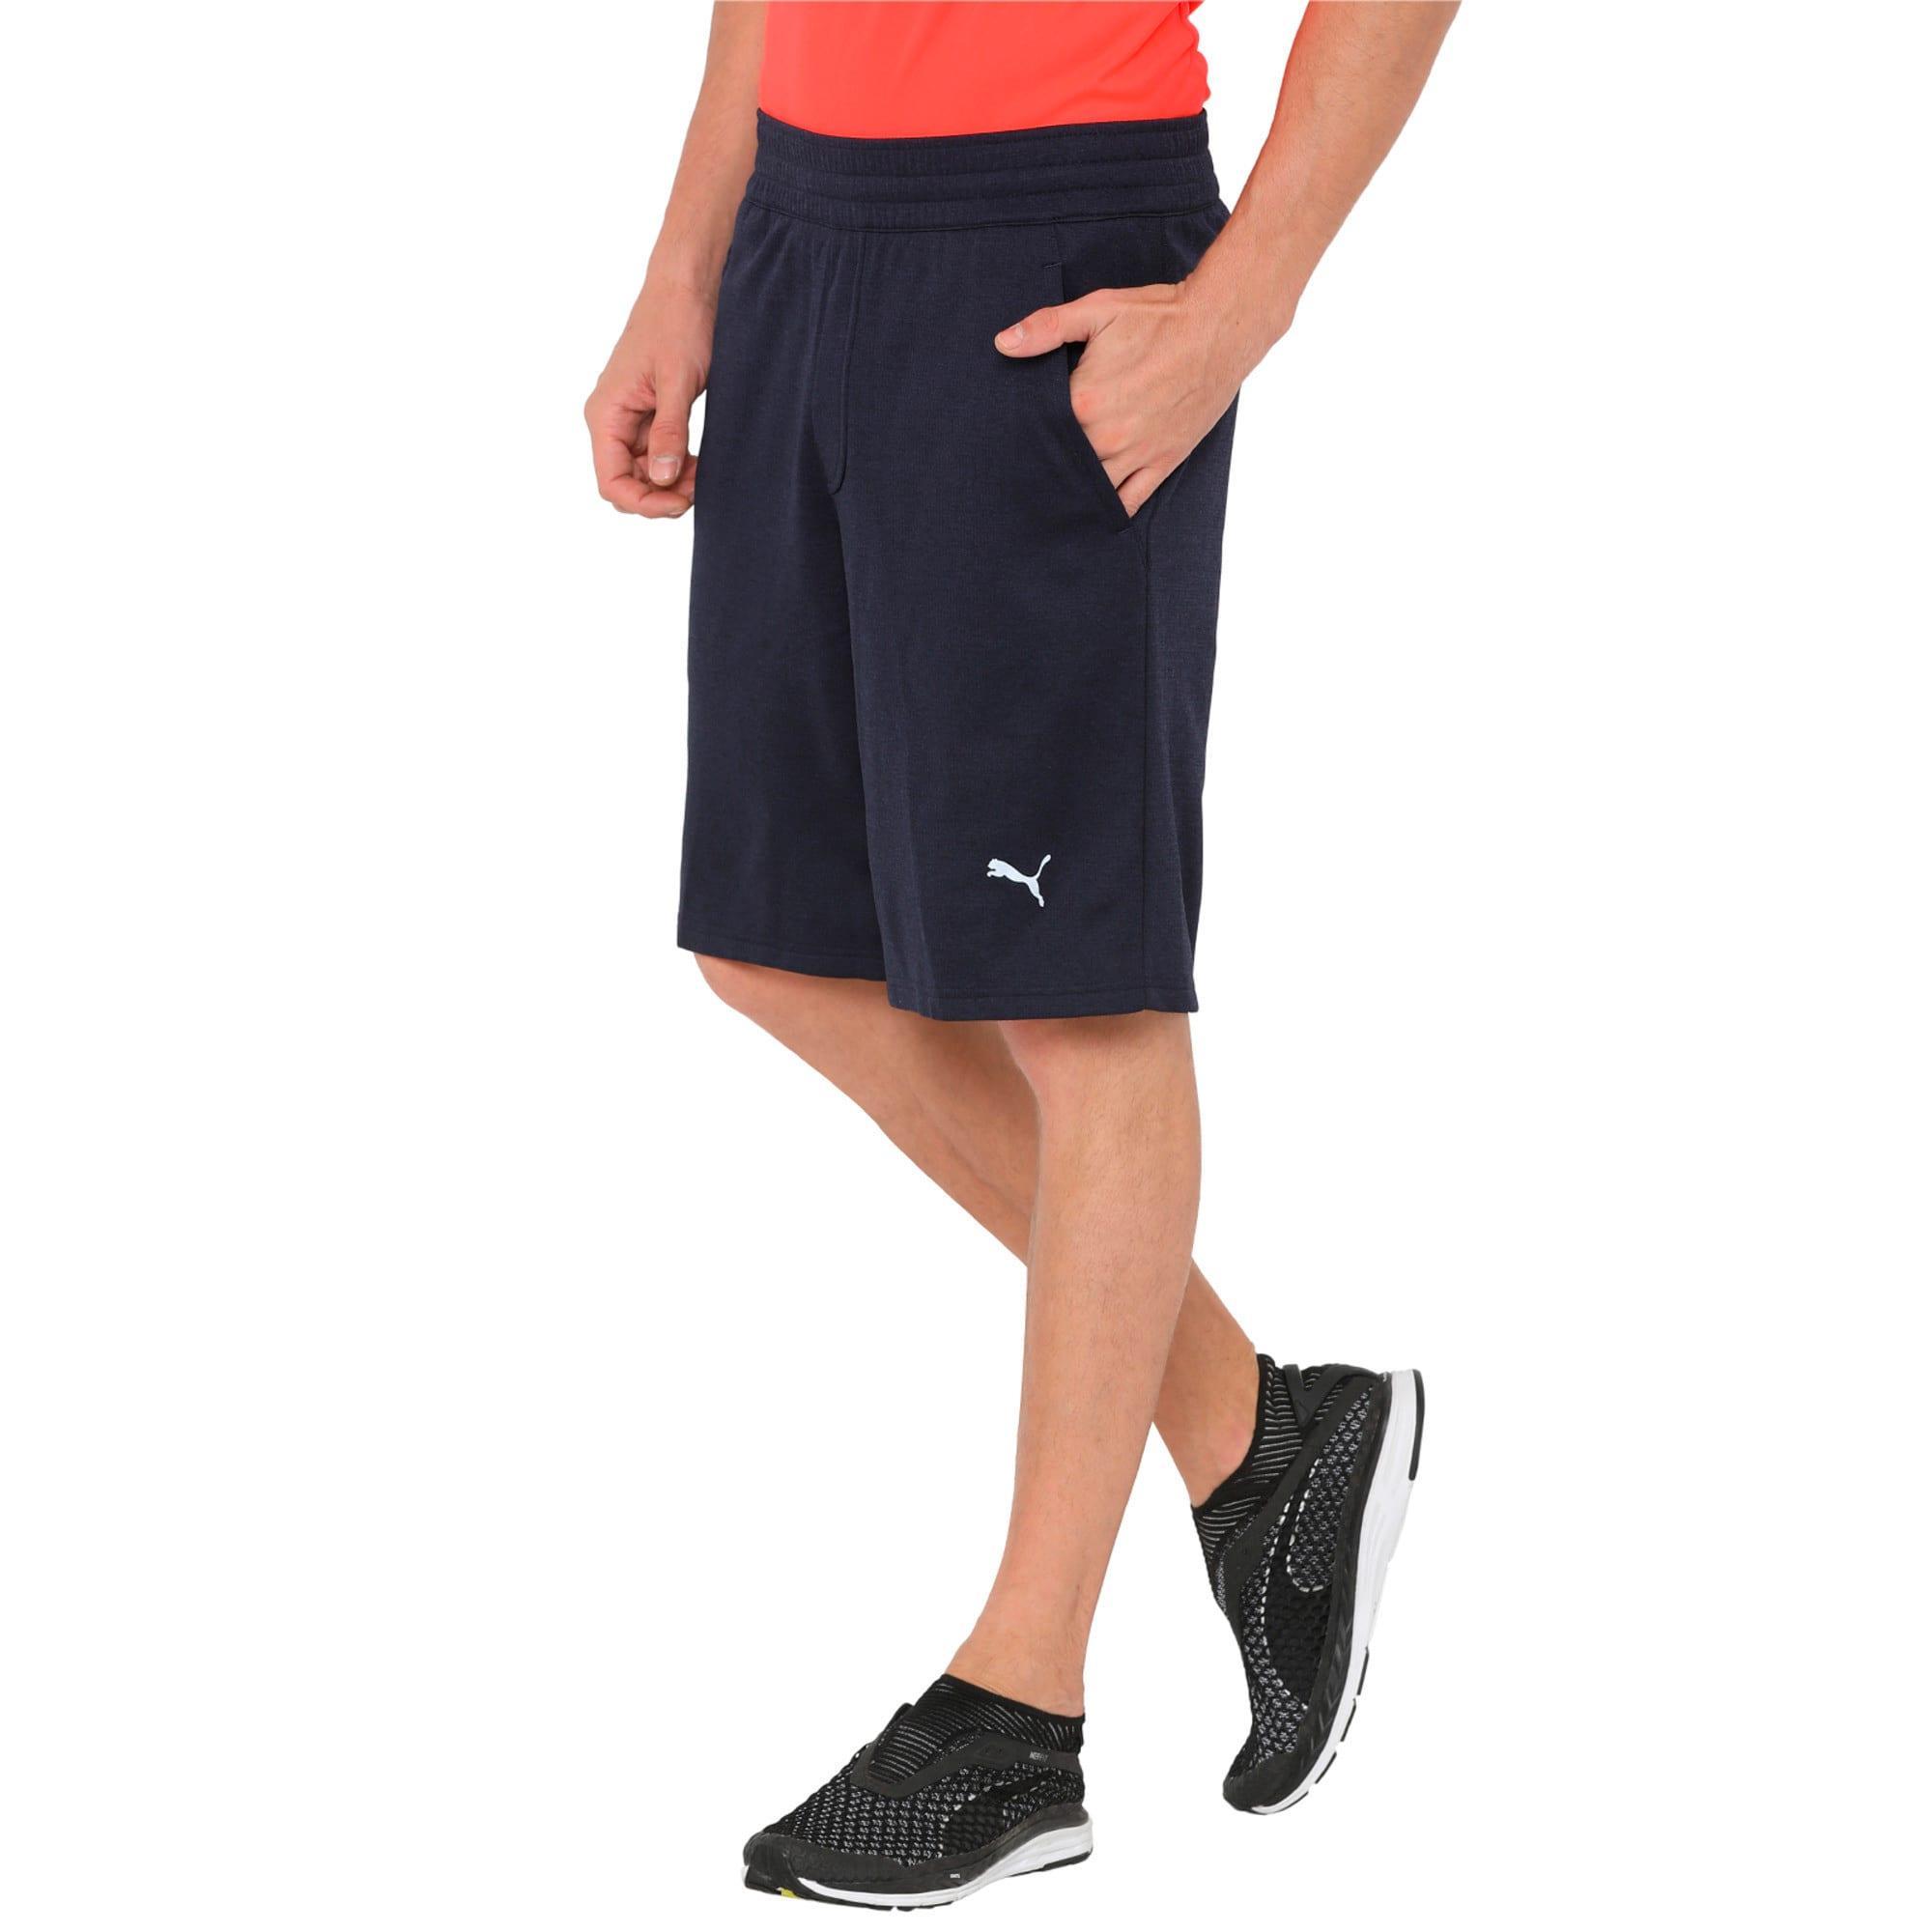 Thumbnail 1 of Oceanaire Energy Men's Shorts, Peacoat Heather, medium-IND